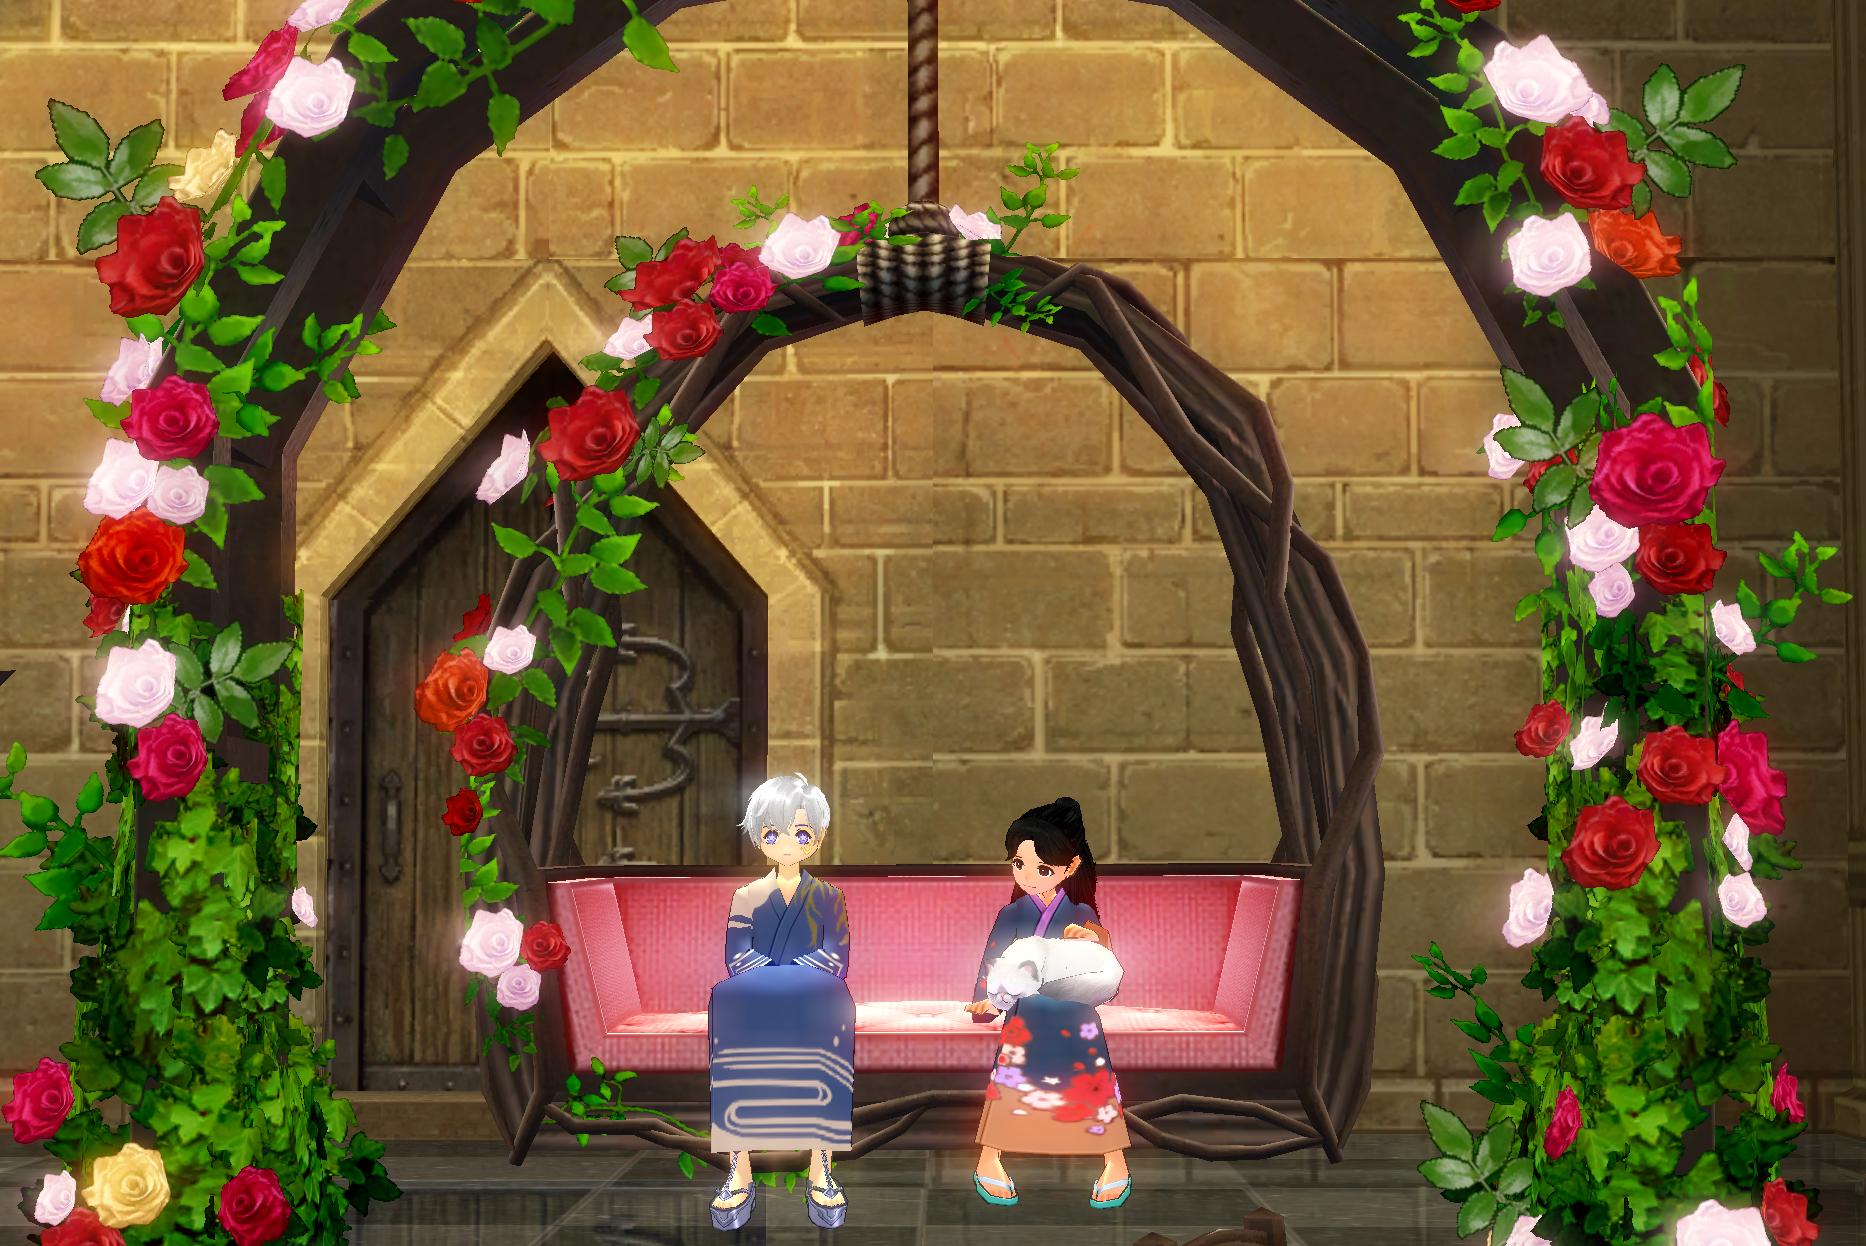 flowerchair2.PNG